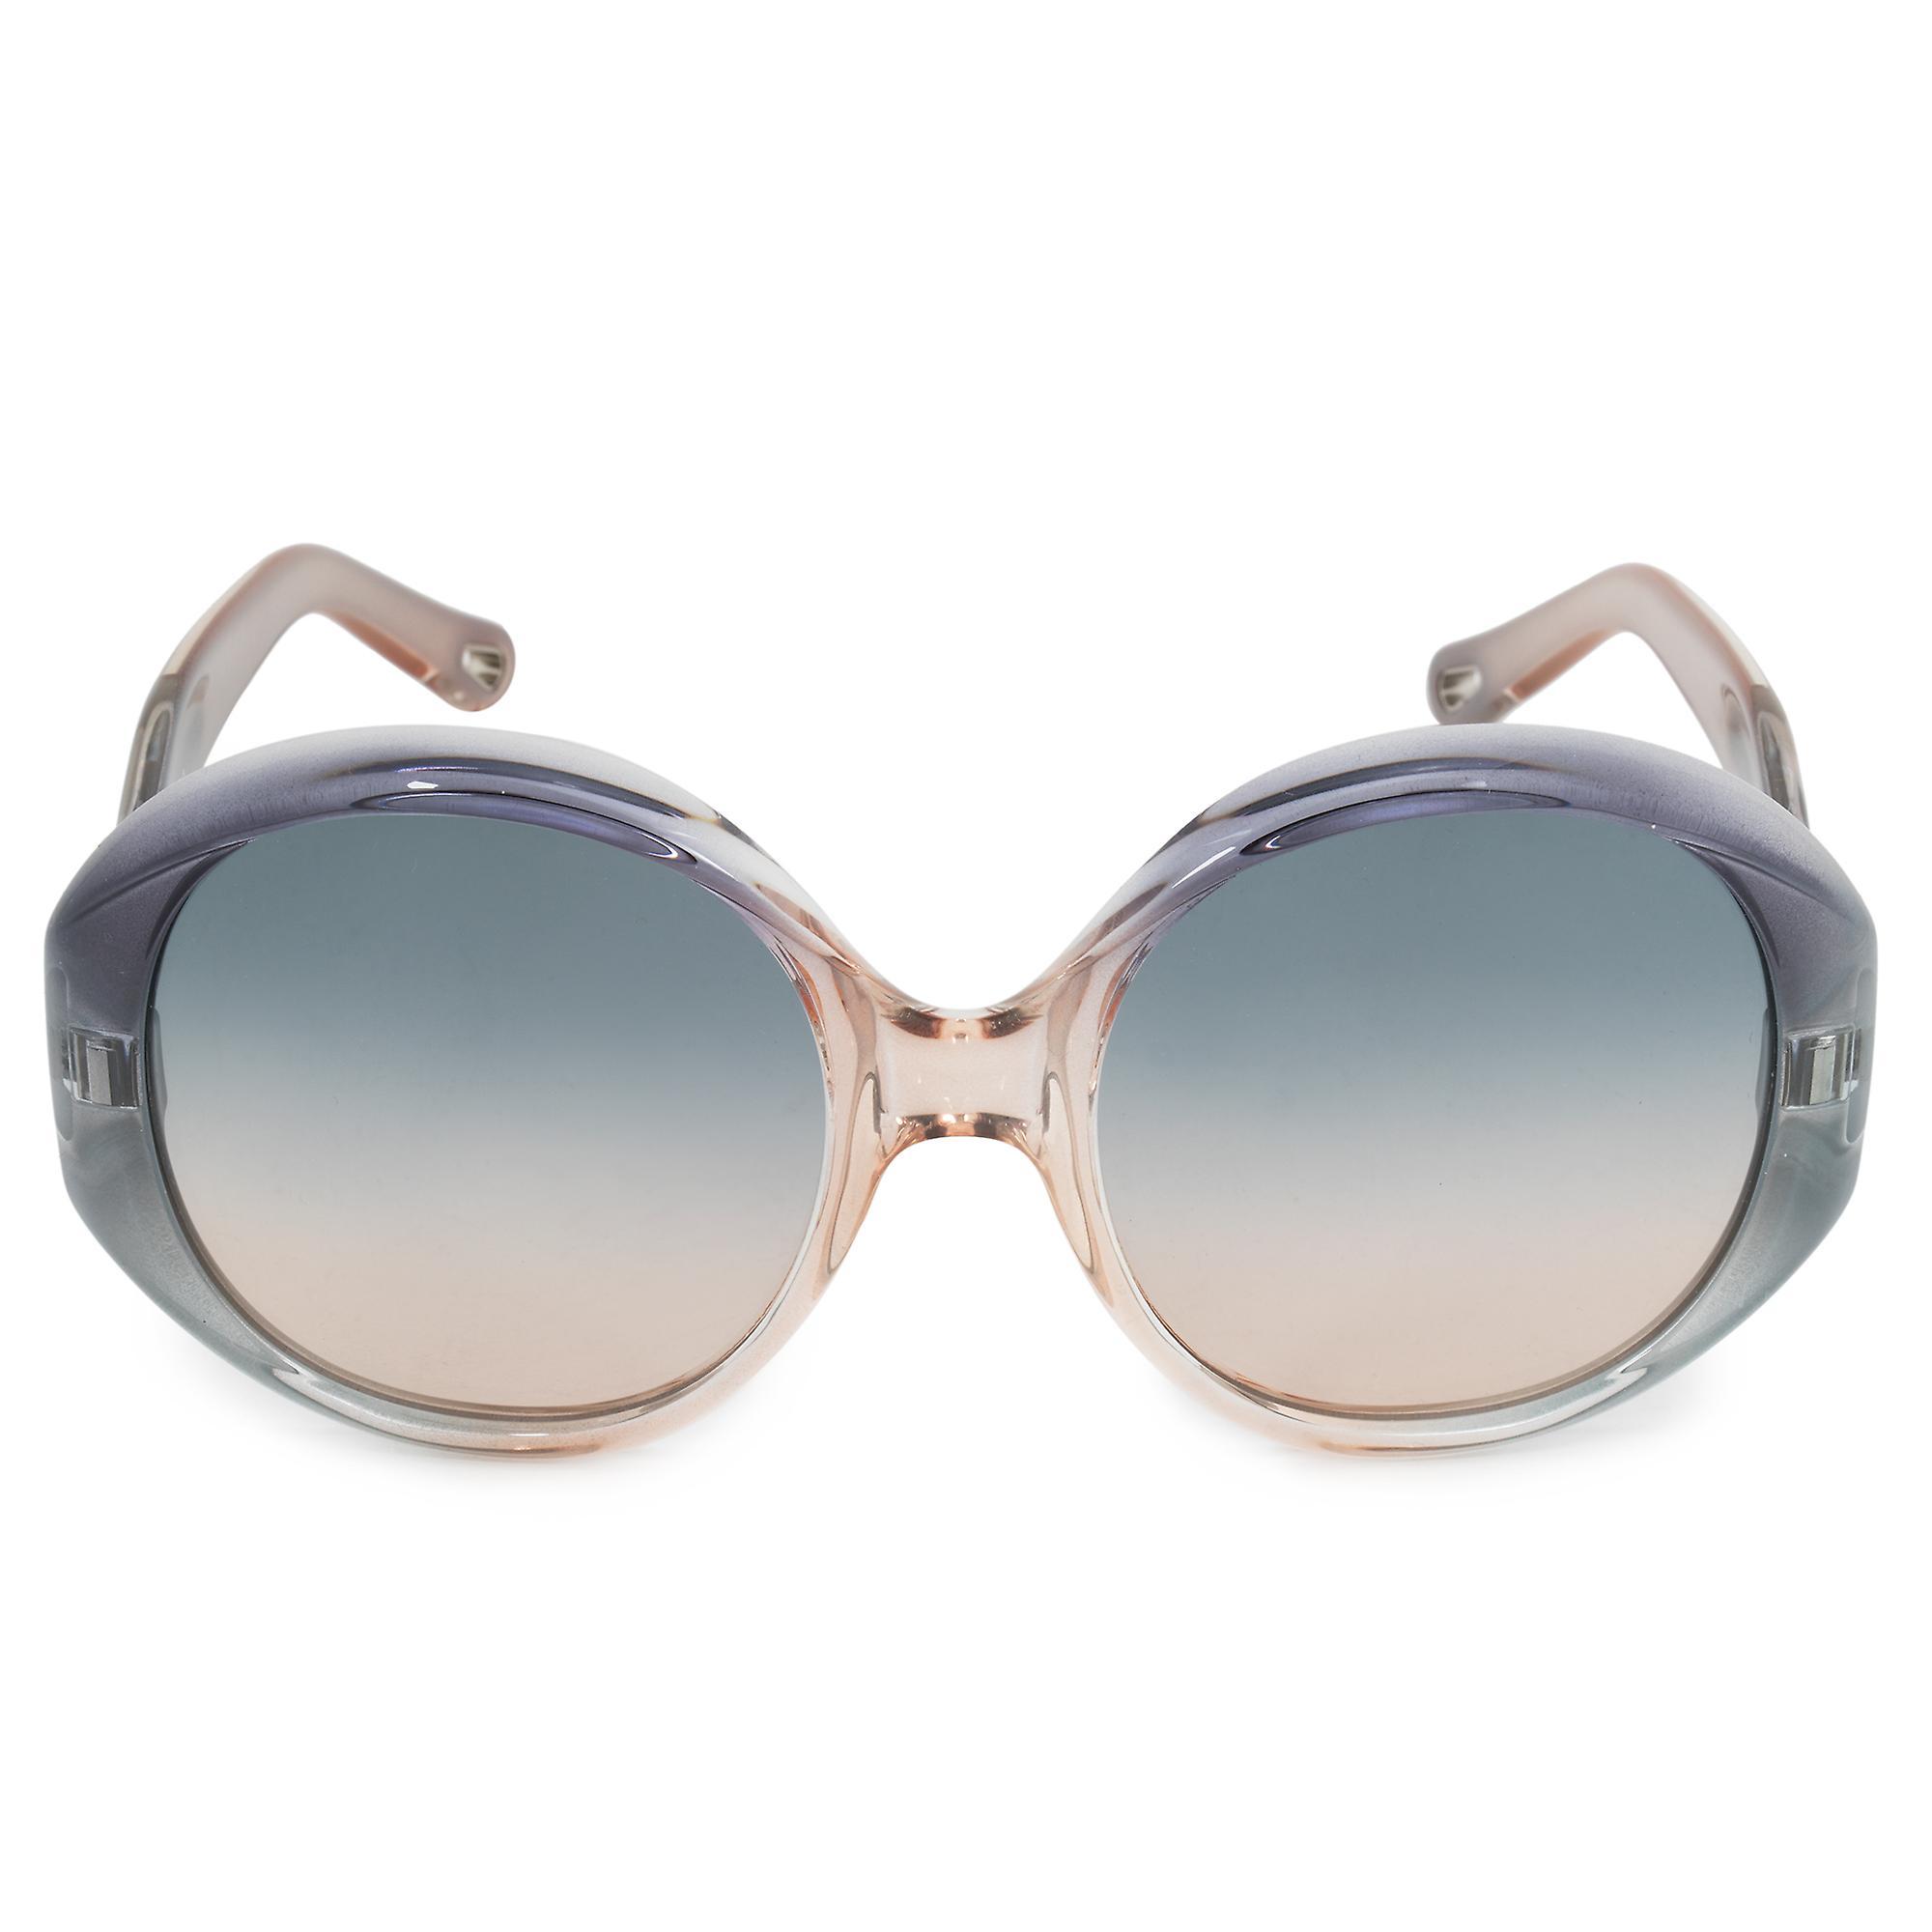 Chloe Oval solbriller CE732S 037 57